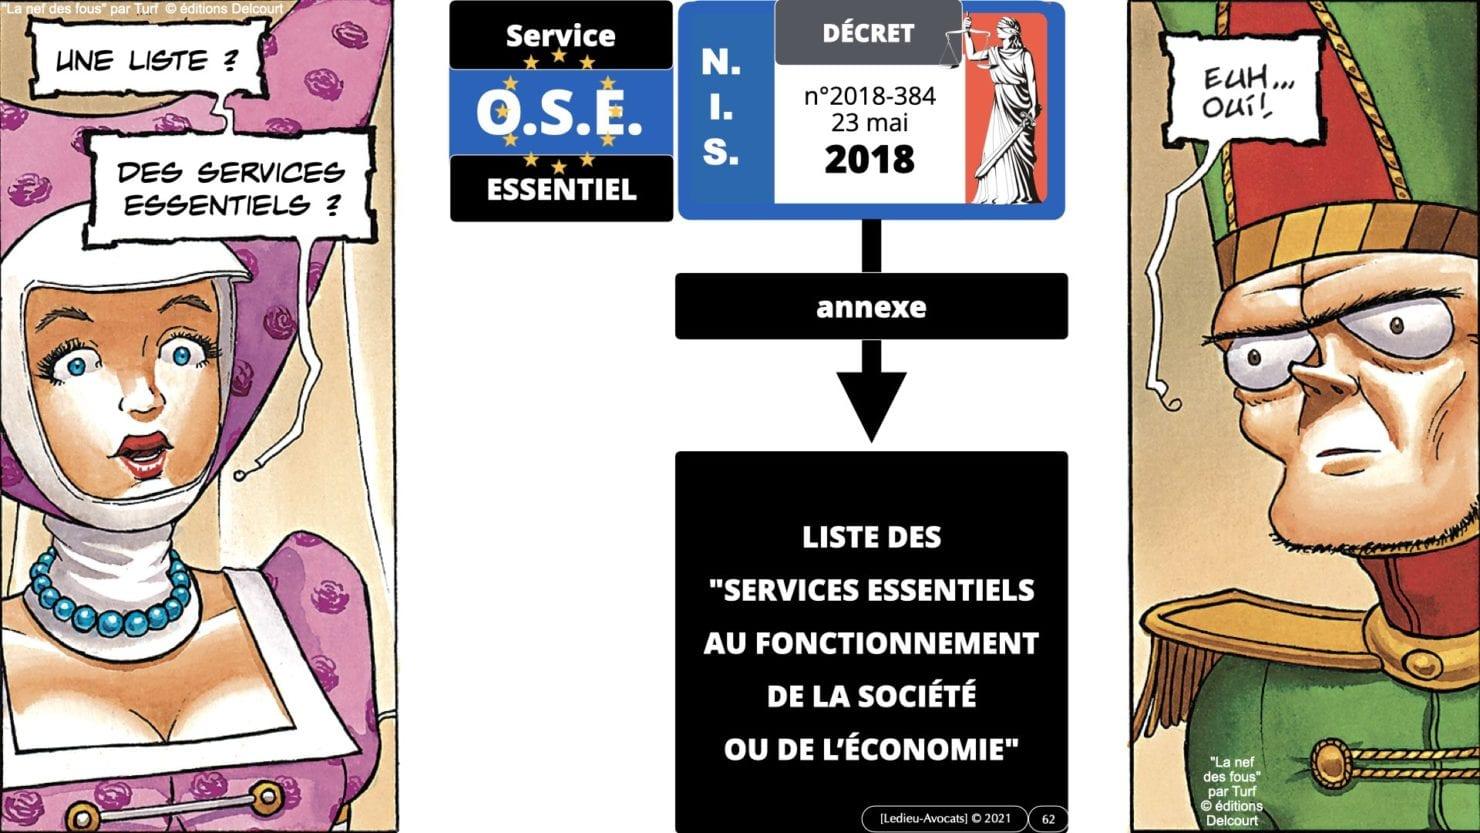 337 cyber sécurité #1 OIV OSE Critical Entities © Ledieu-avocat 15-06-2021.062